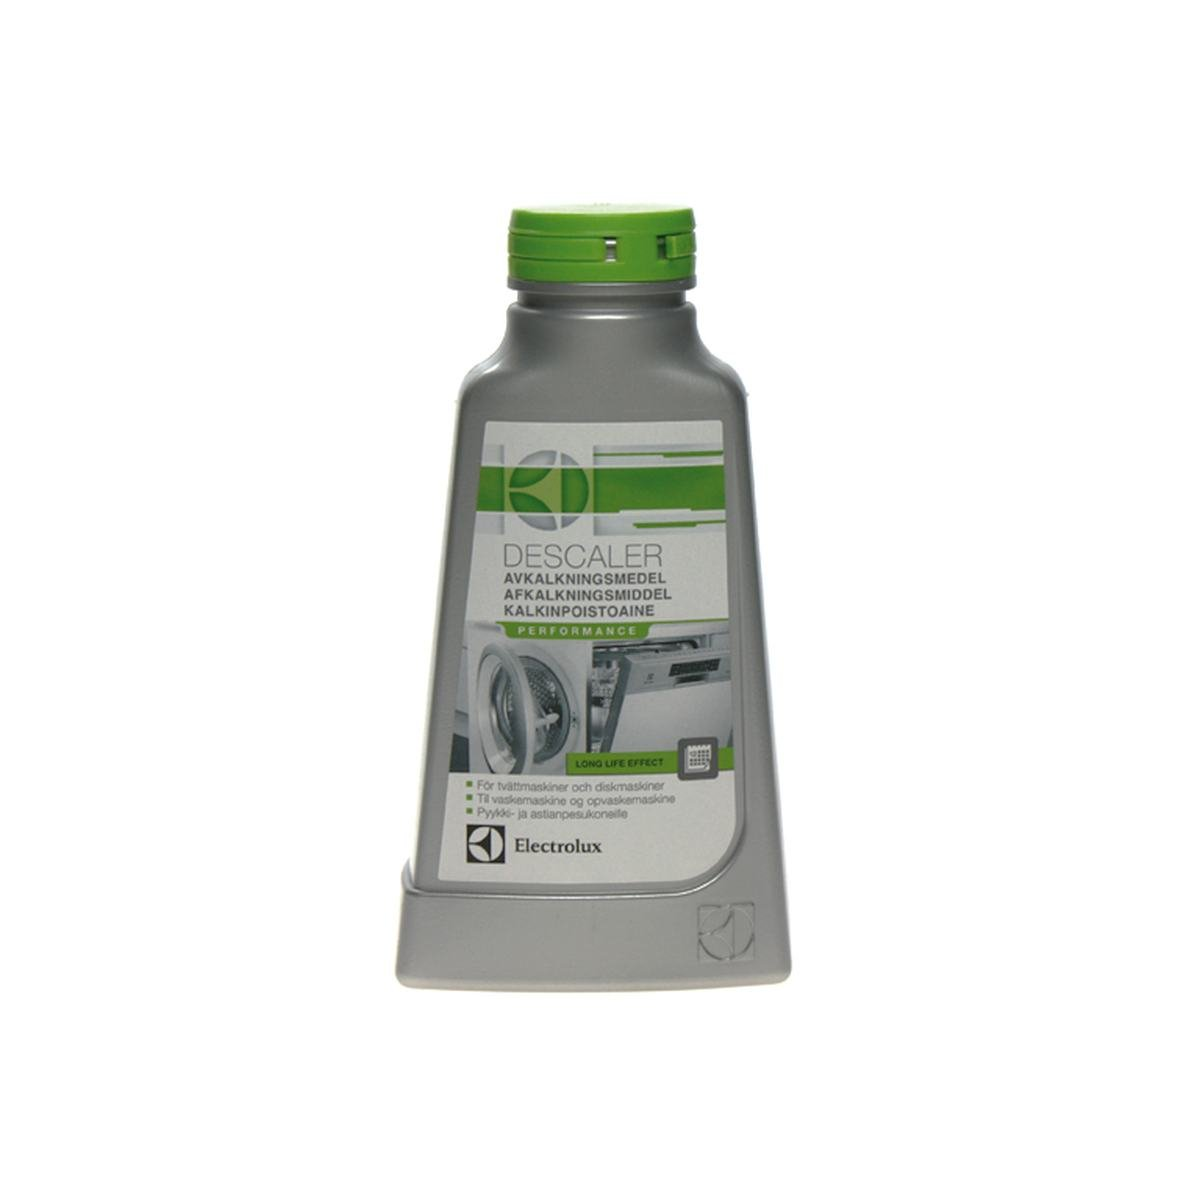 Avkalkningsmedel 200 gram - Electrolux